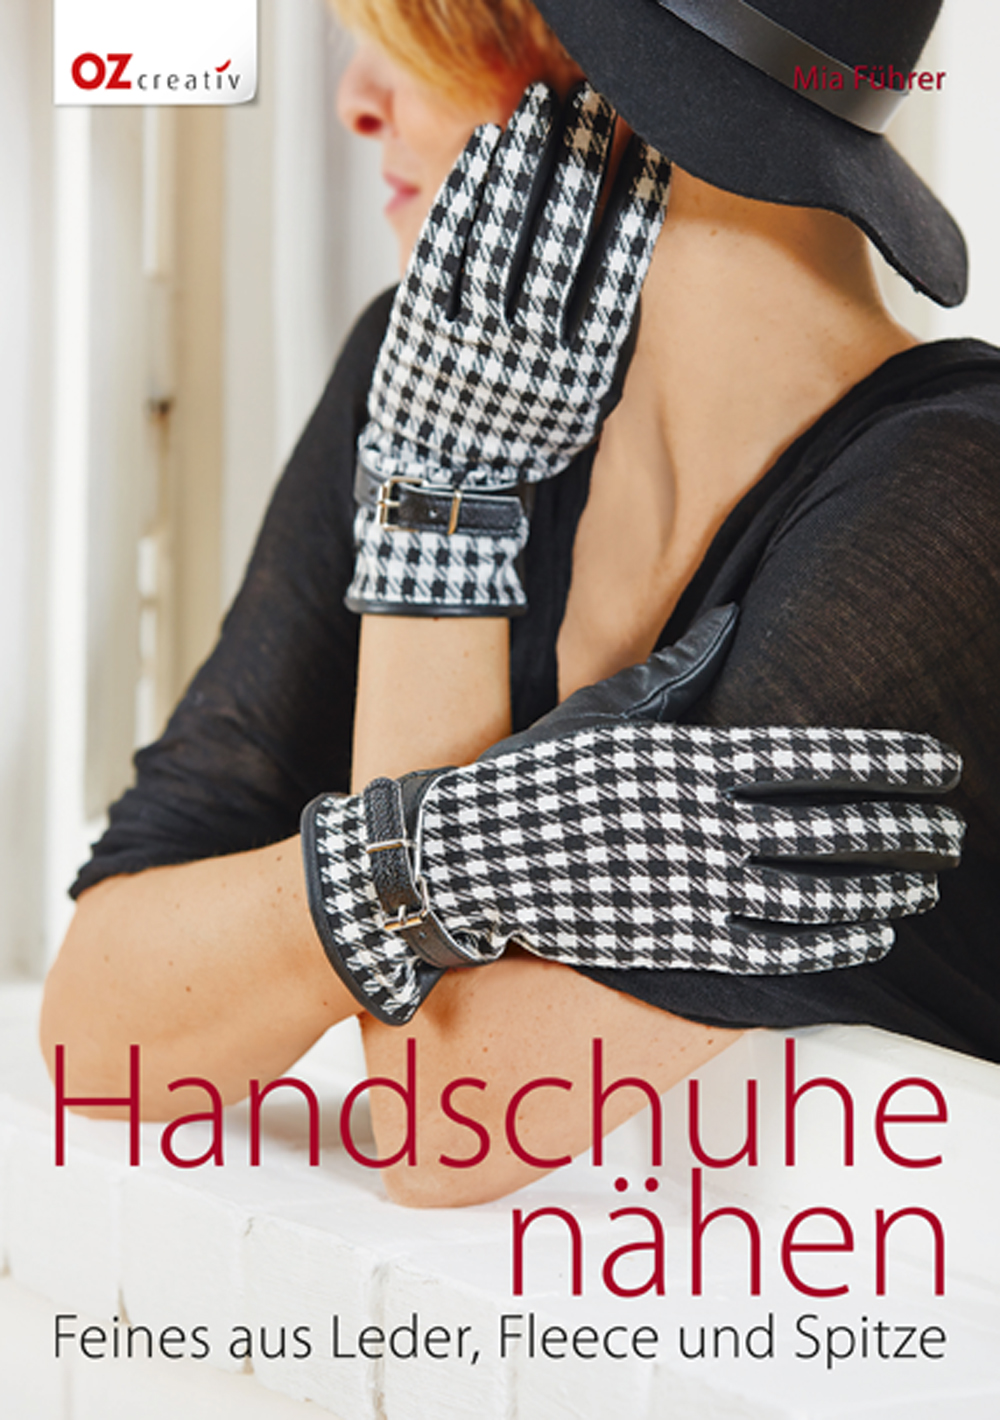 OZ creativ 6298 Handschuhe